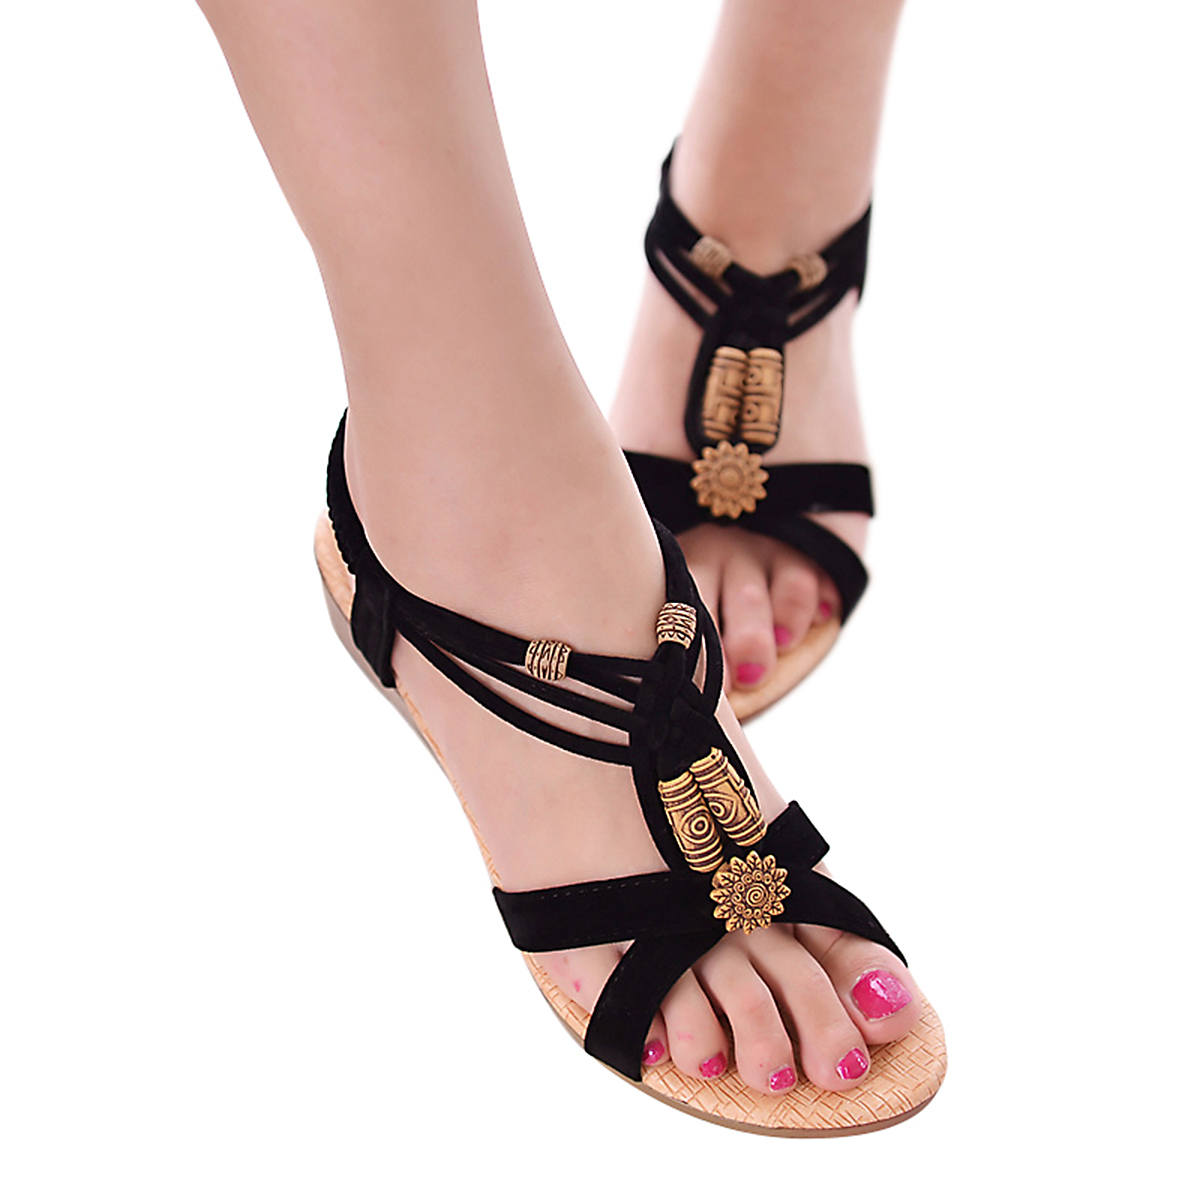 New Arrival Women Sandals Summer women shoes Slip On Gladiator Flip Flops Spring Fashion Shoes 2016 new arrival summer shoes women sandals fashion women flats shoes women flip flops free shipping